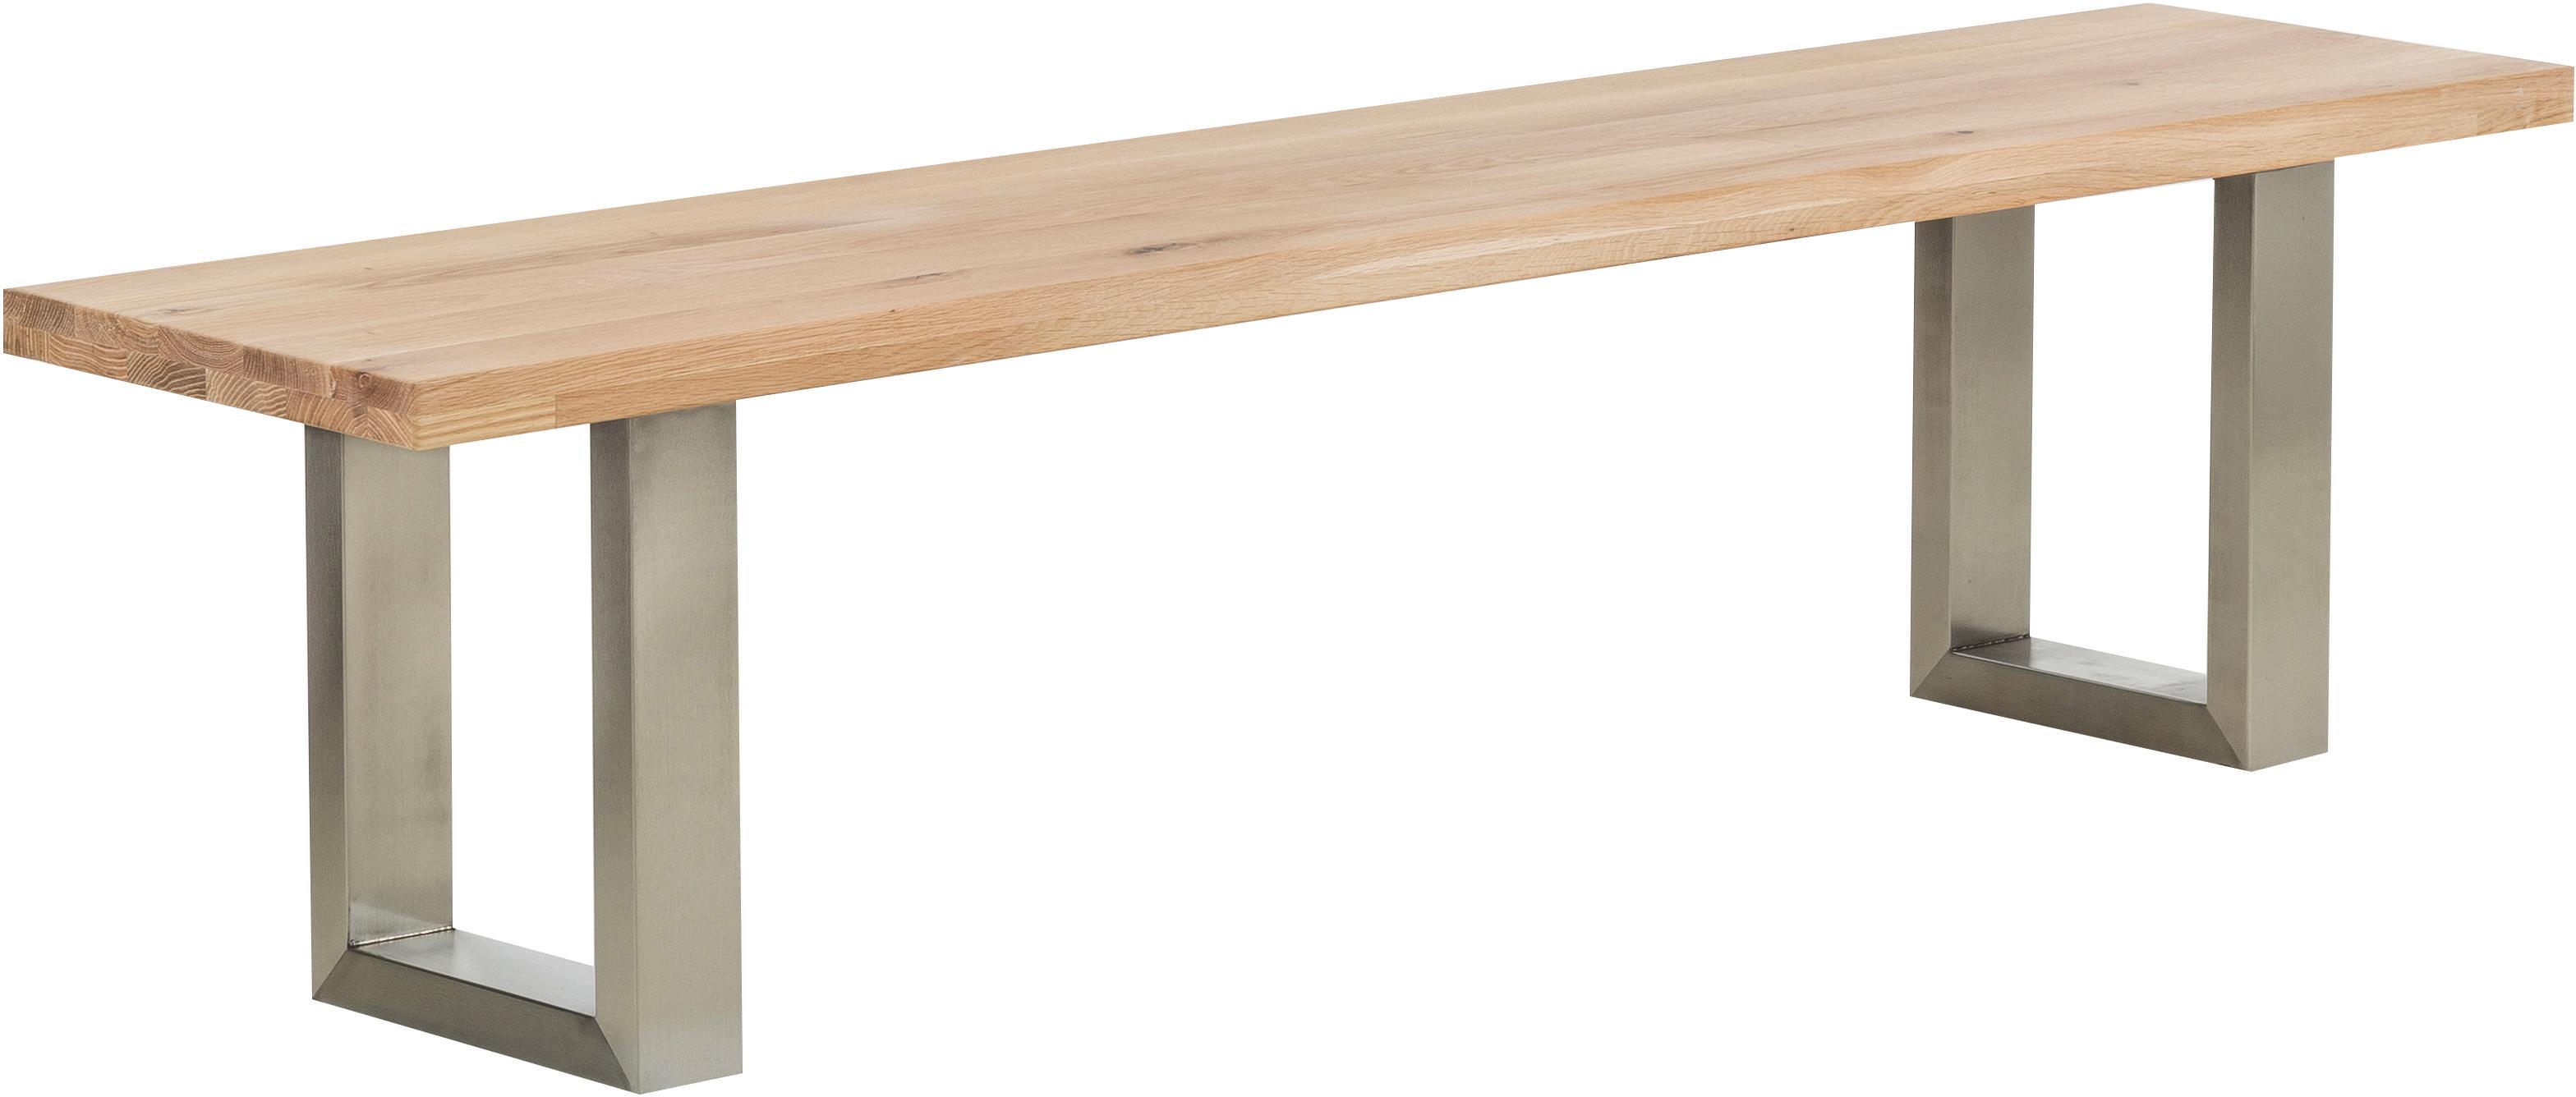 Panca in legno di quercia Oliver, Seduta: Quercia selvatica europea, Gambe: opaco spazzolato acciaio , Seduta: quercia selvatica gambe: acciaio inossidabile opaco spazzolato, Larg. 180 x Alt. 45 cm